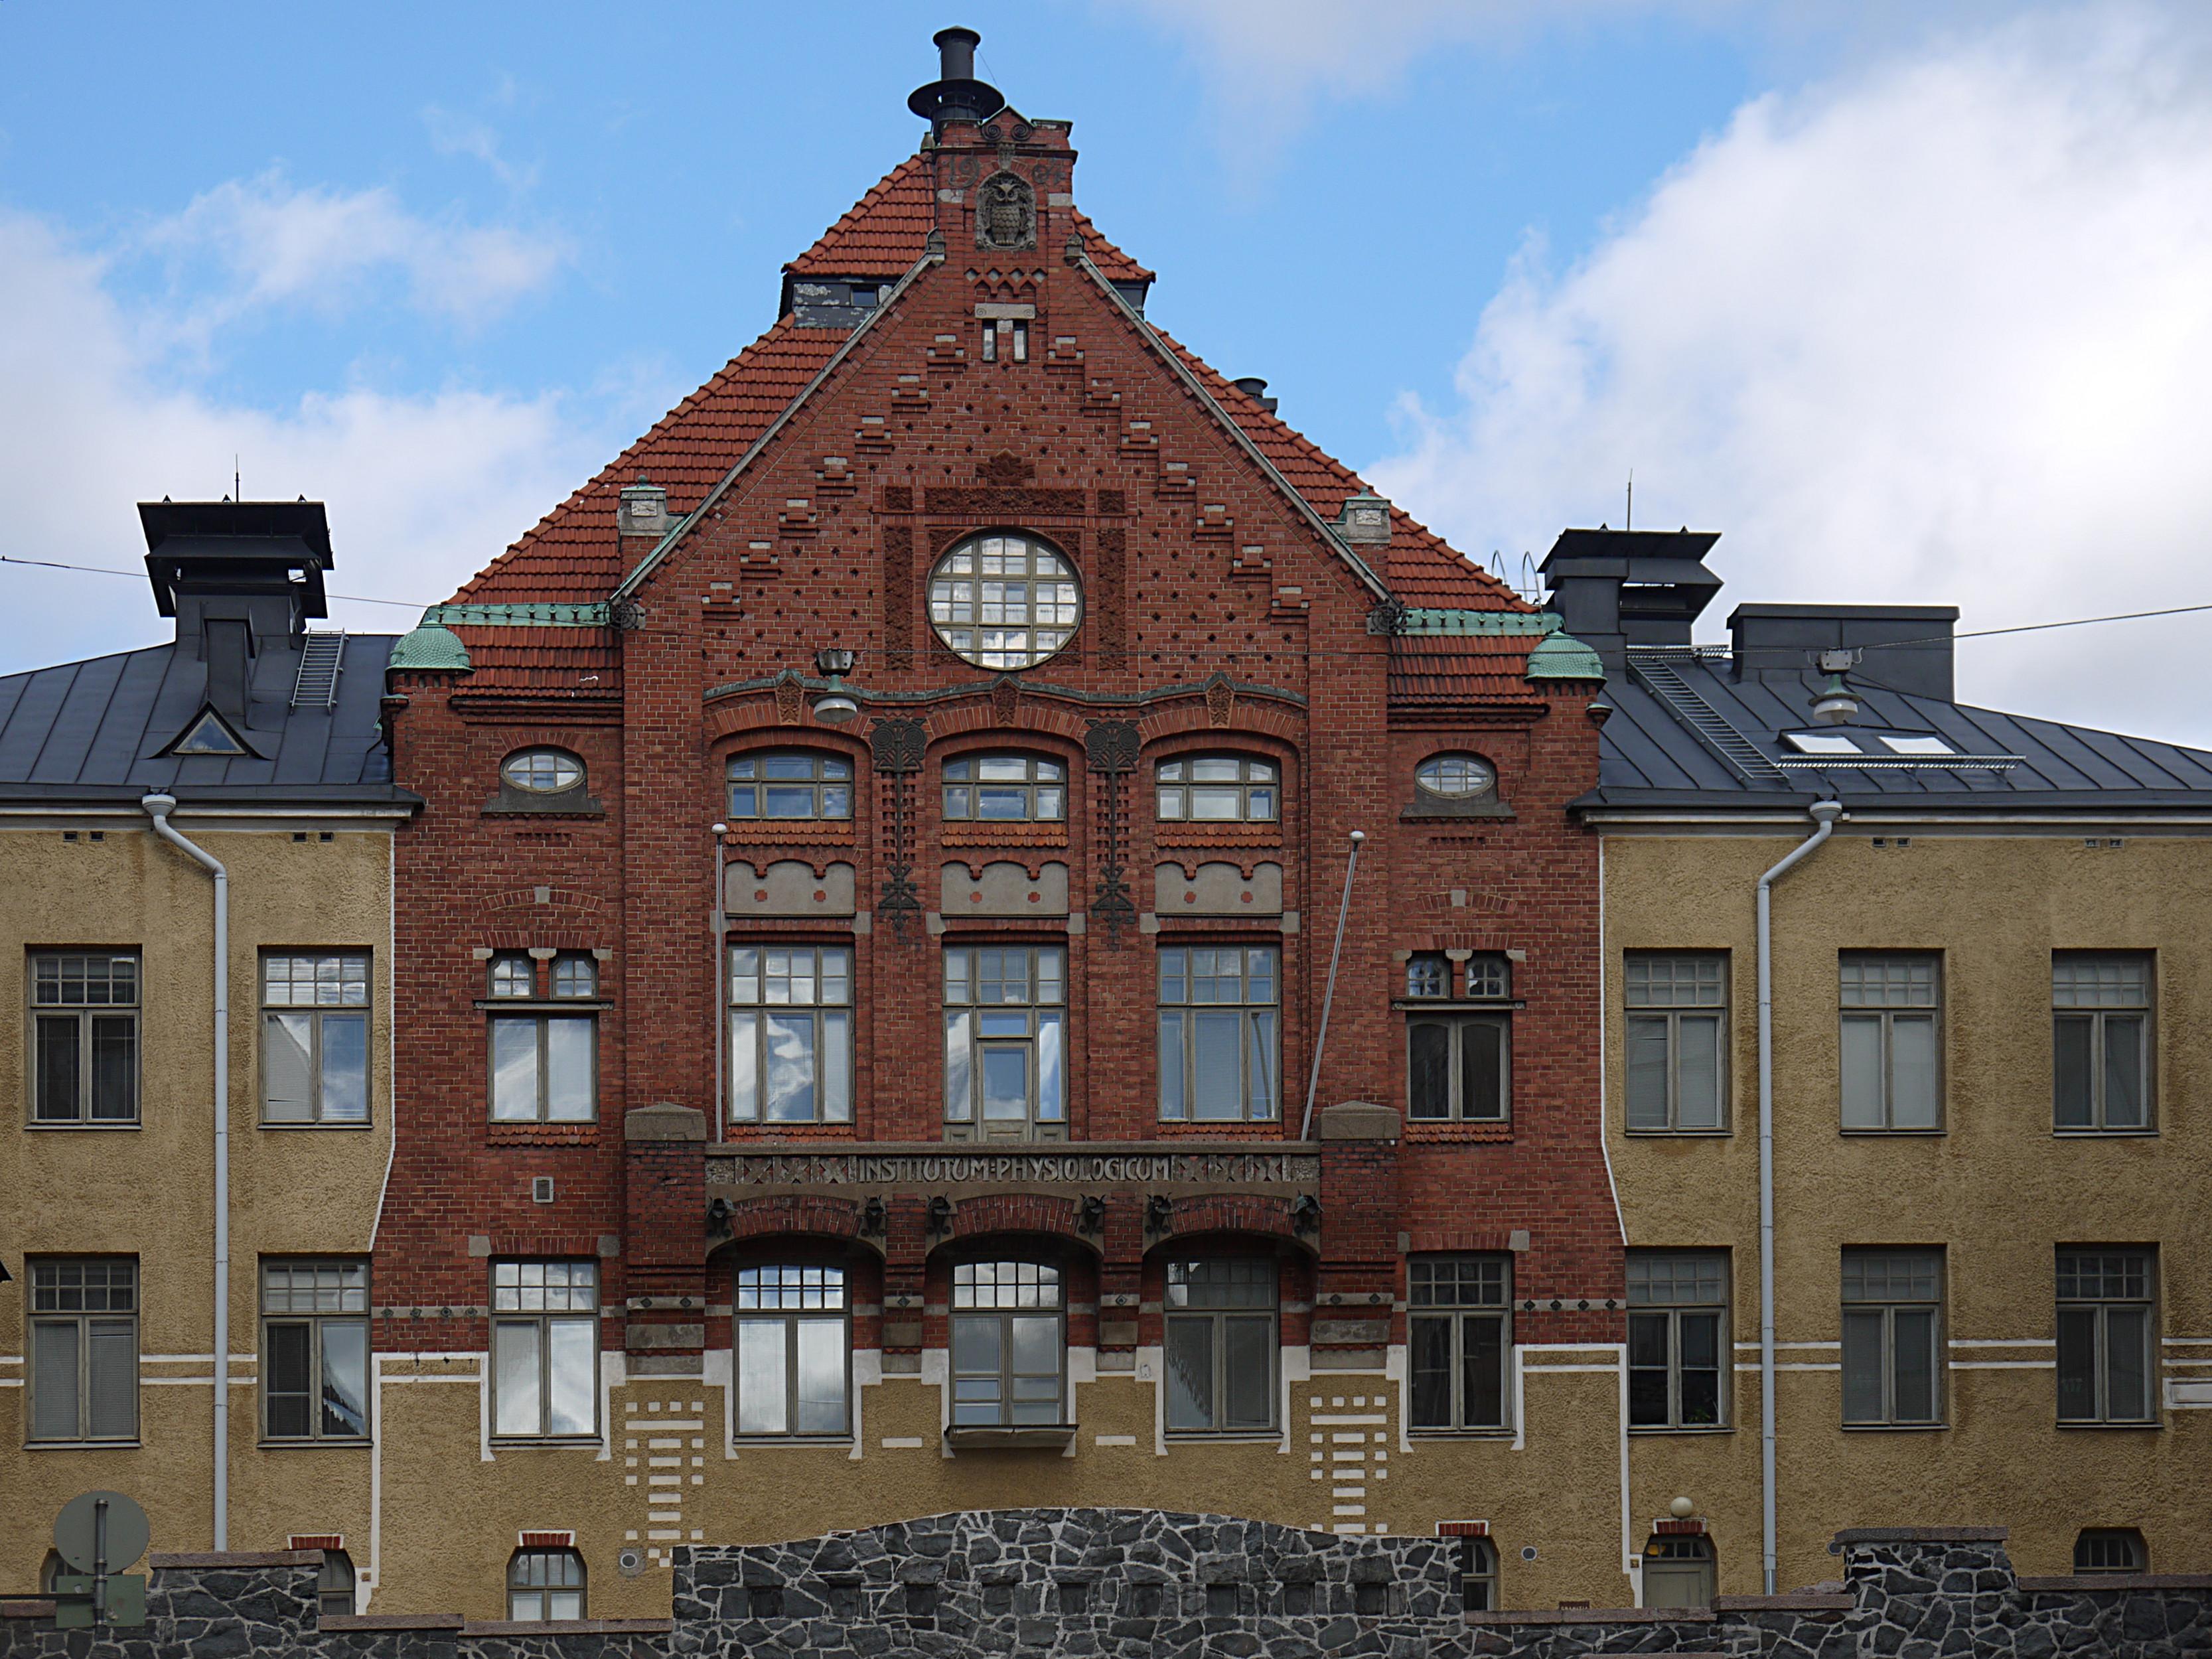 File:University of Helsinki, Faculty of Behavioural Sciences.JPG - Wikimedia Commons